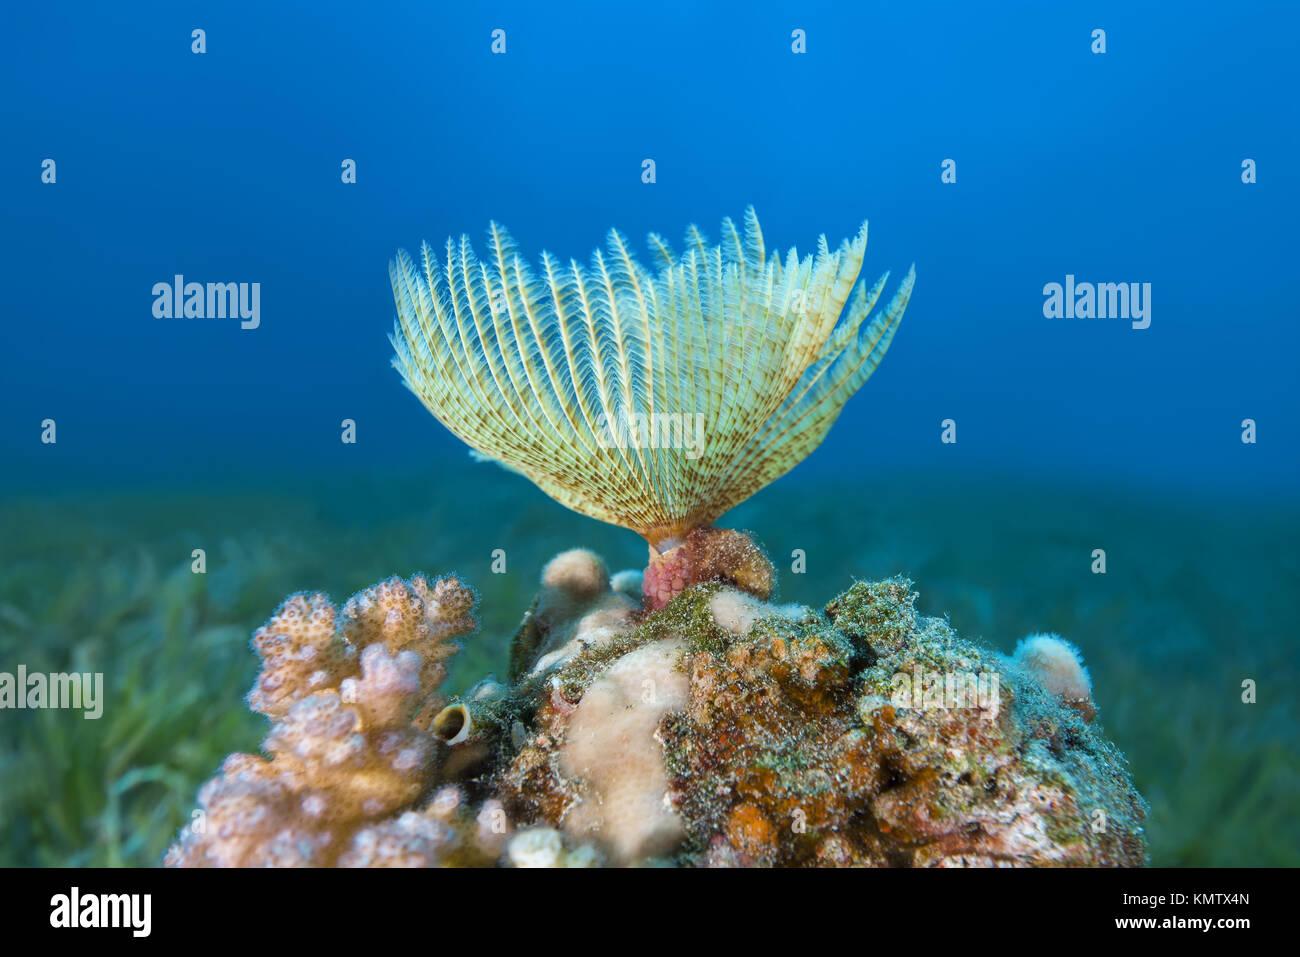 Indian Feather Duster Worm (Sabellastarte spectabilis) - Stock Image